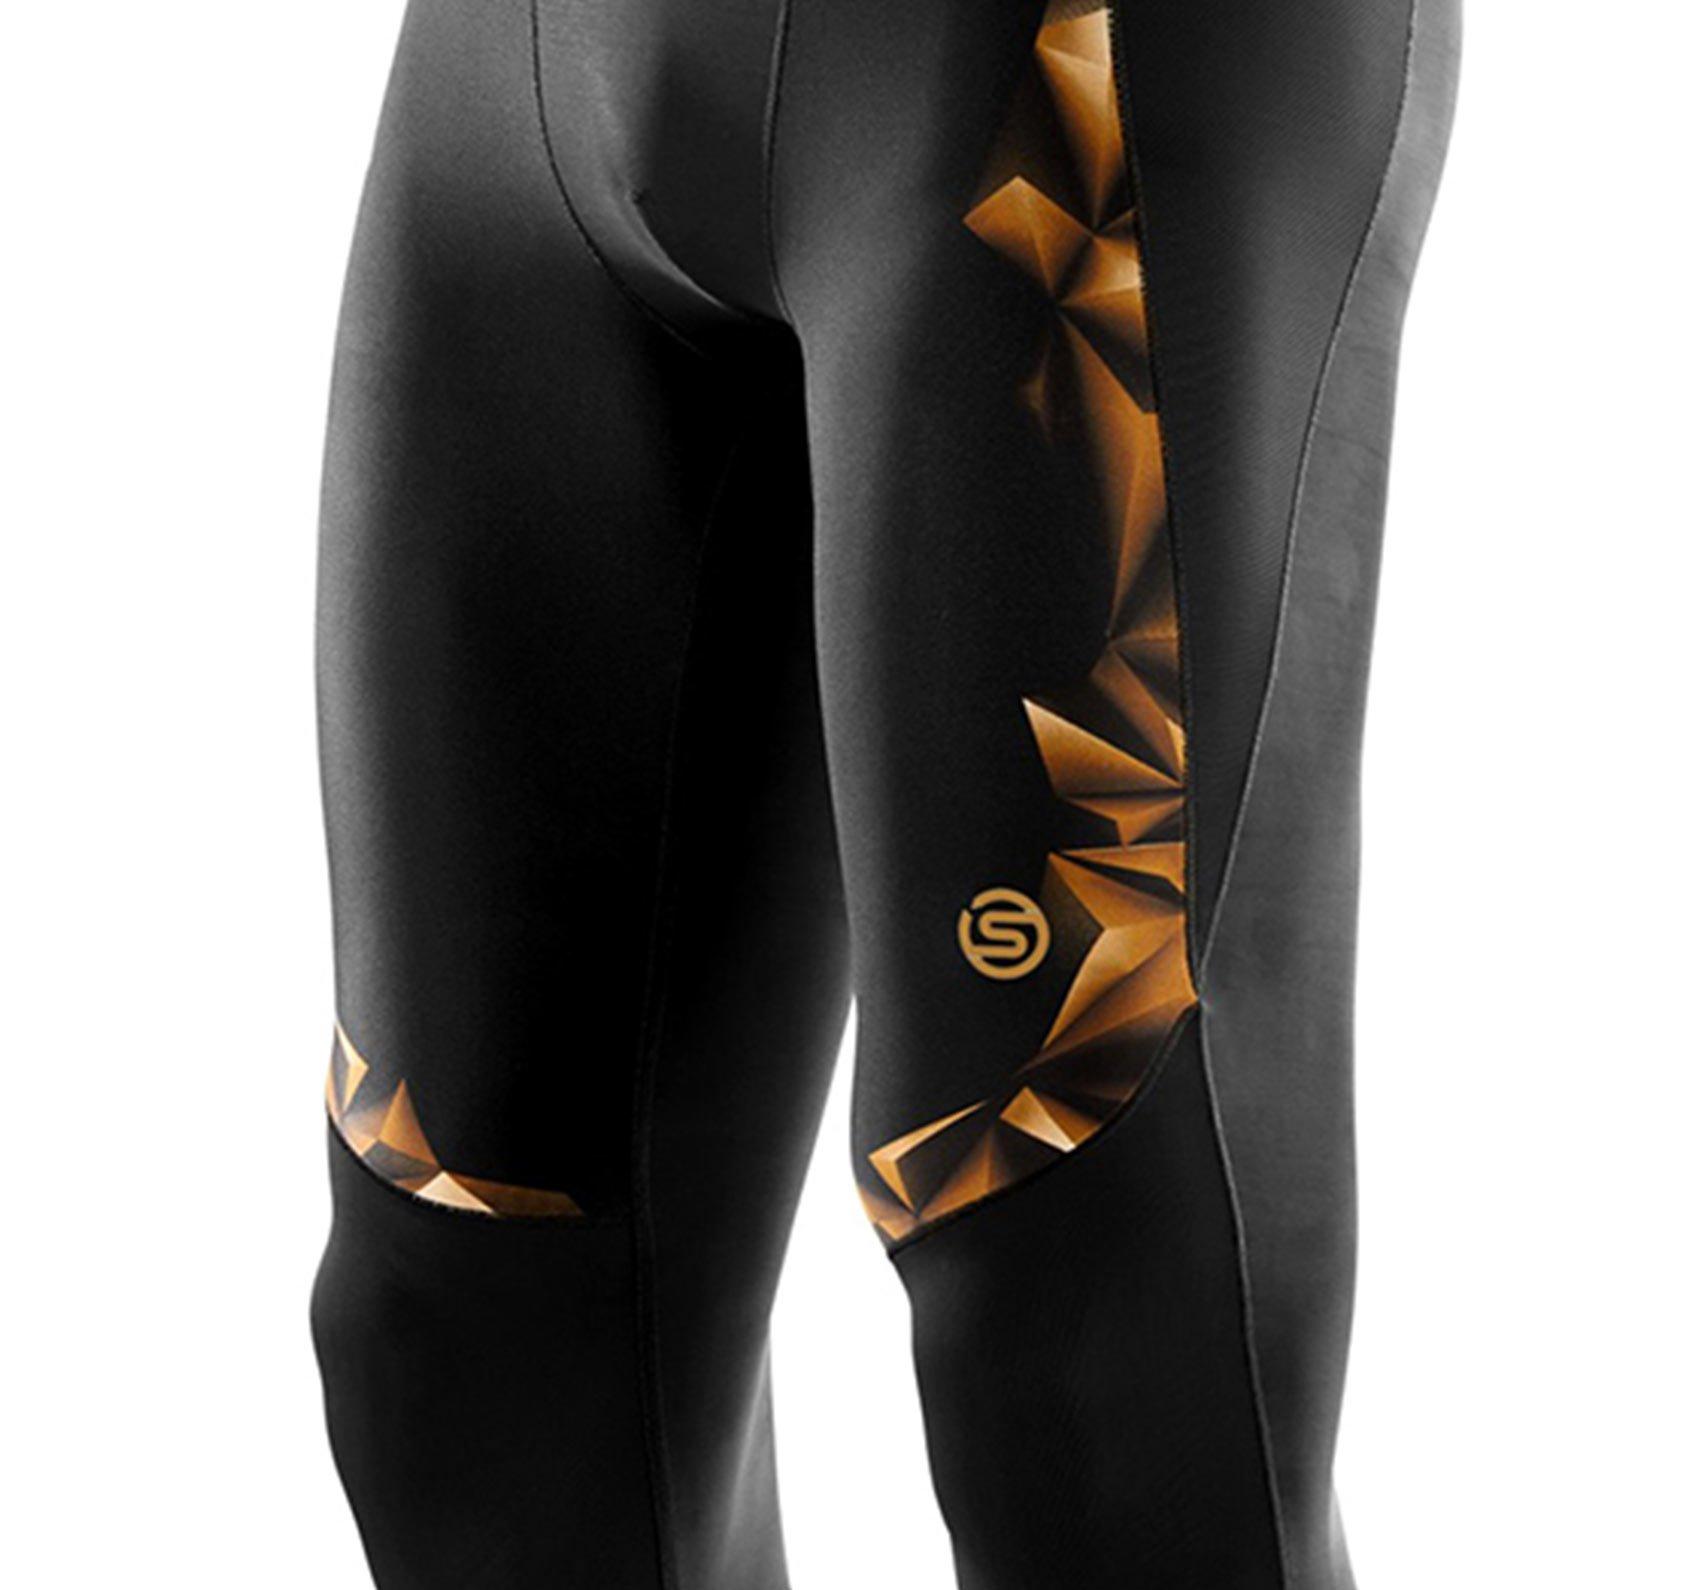 Skins Men's A400 Compression 3/4 Tights, Black/Gold, X-Large by Skins (Image #5)